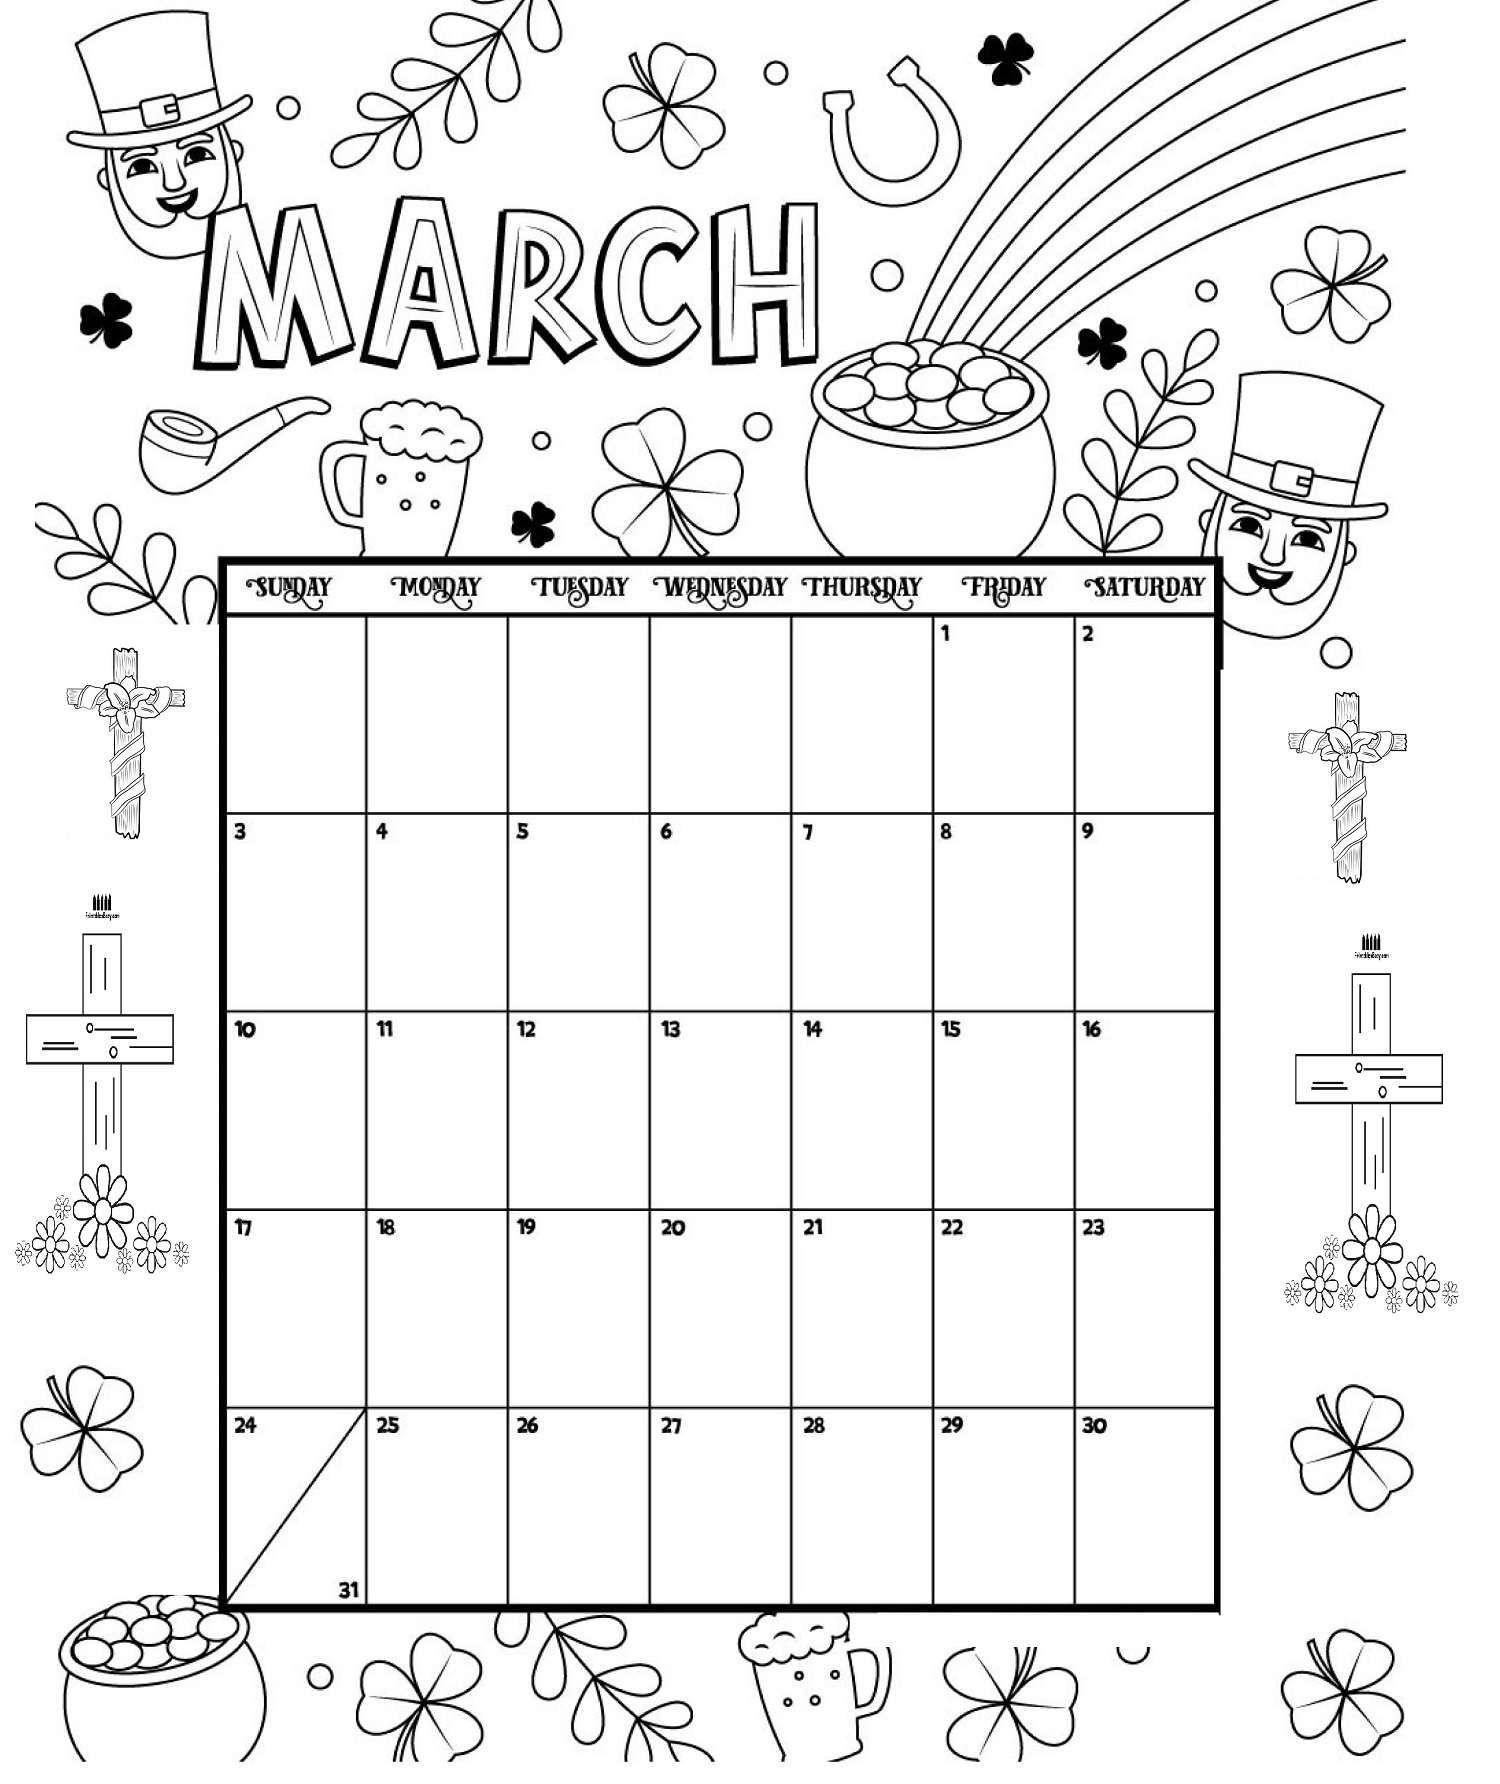 March Printable Coloring Calendar 2019 | Kids calendar ...